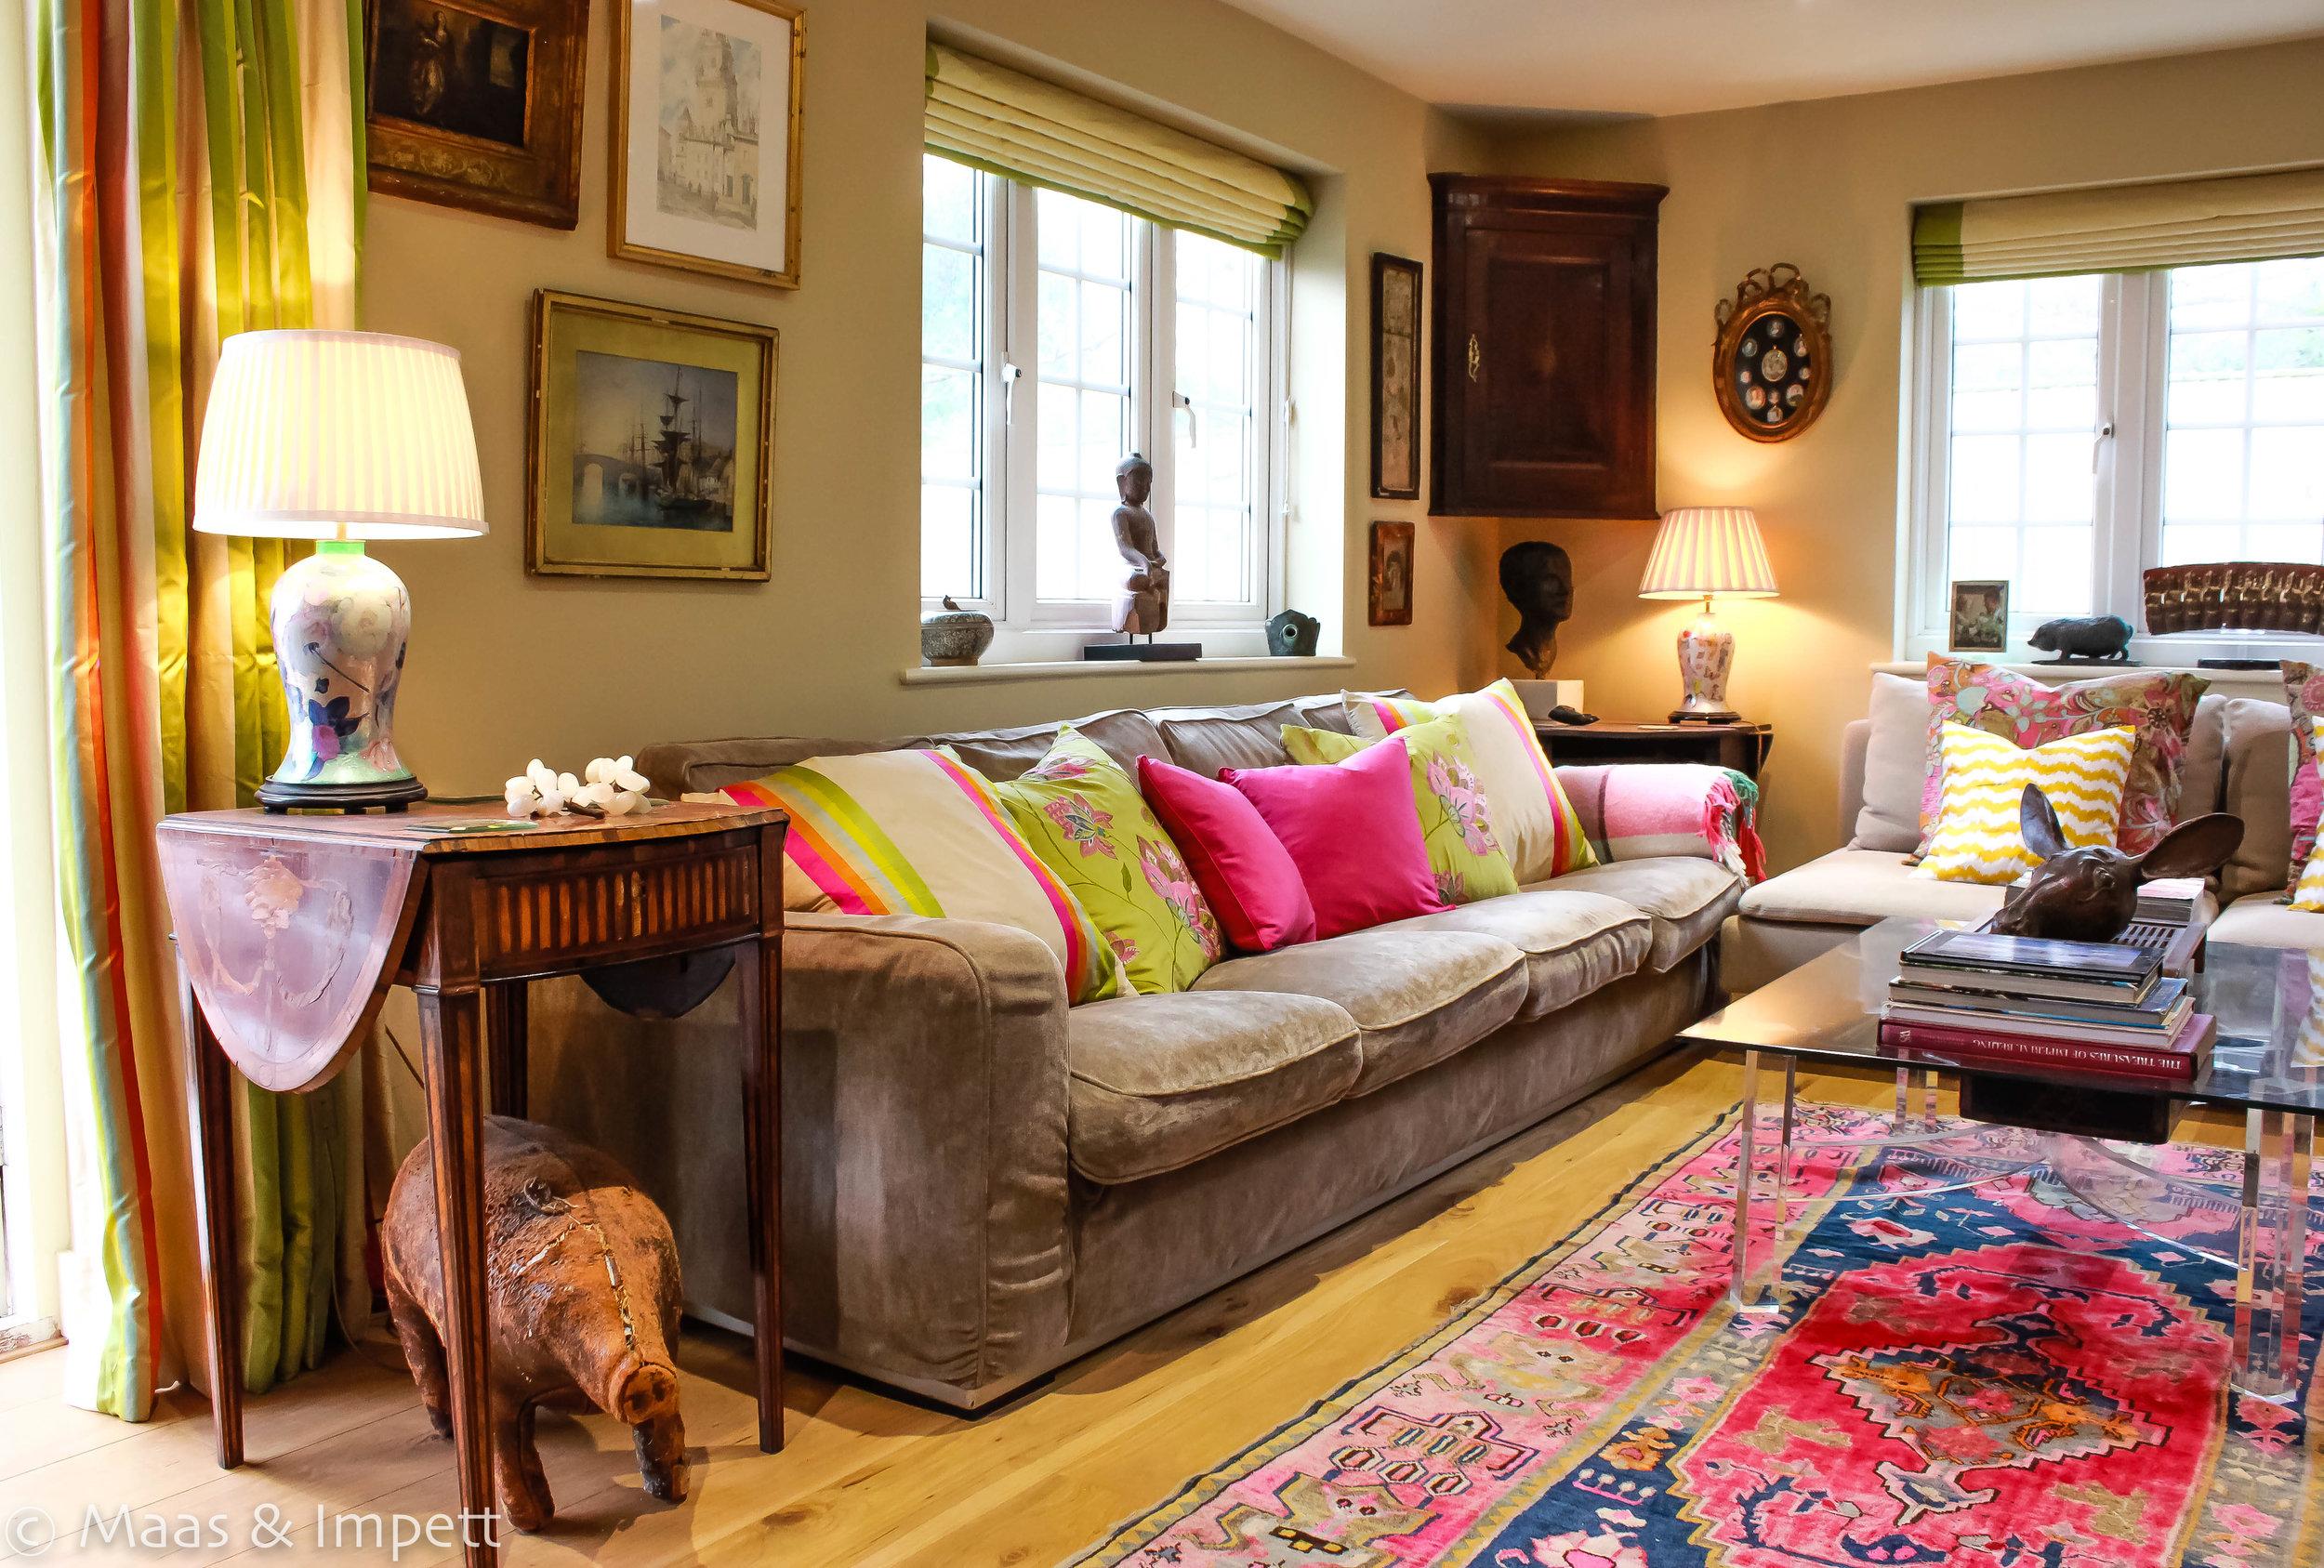 Interior design by Maas & Impett